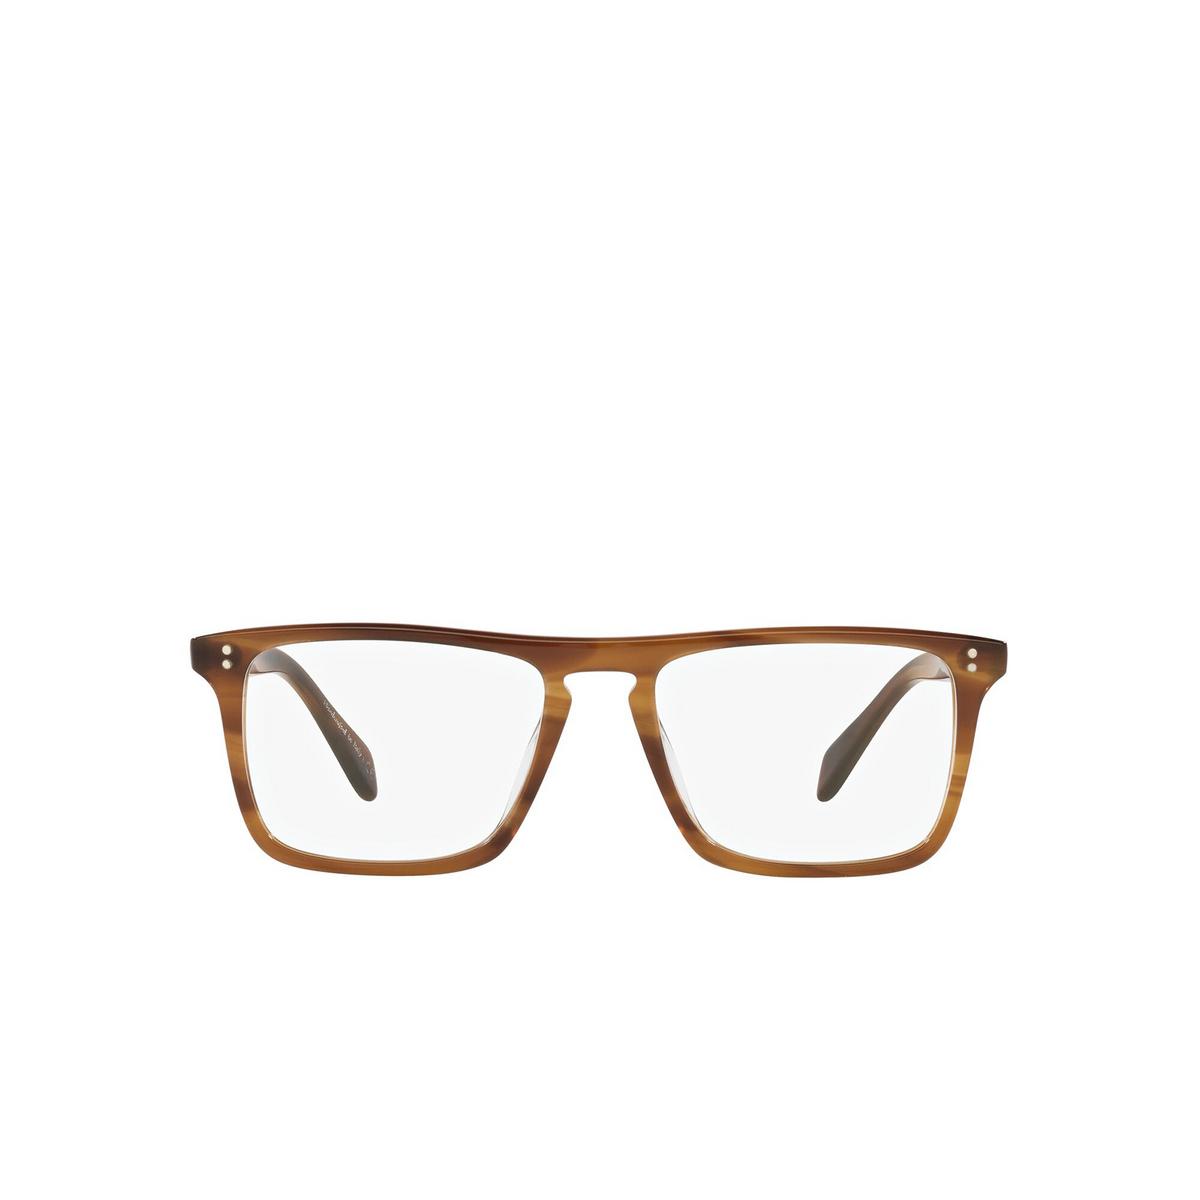 Oliver Peoples® Square Eyeglasses: Bernardo-r OV5189U color Raintree 1011 - front view.